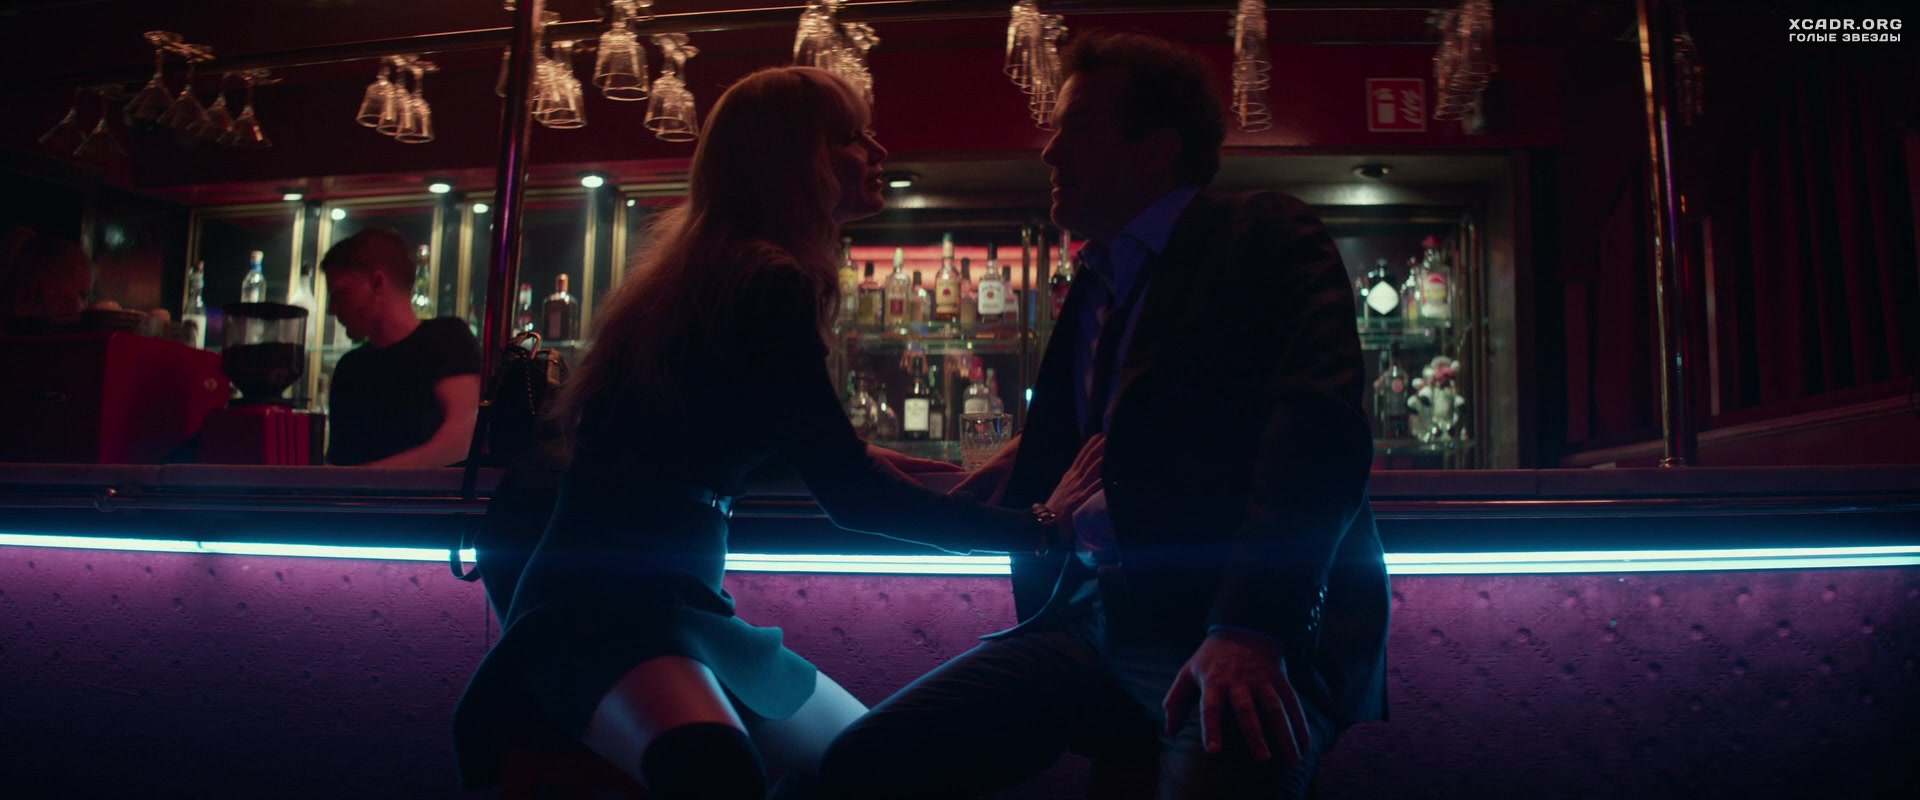 film-pro-seksualnie